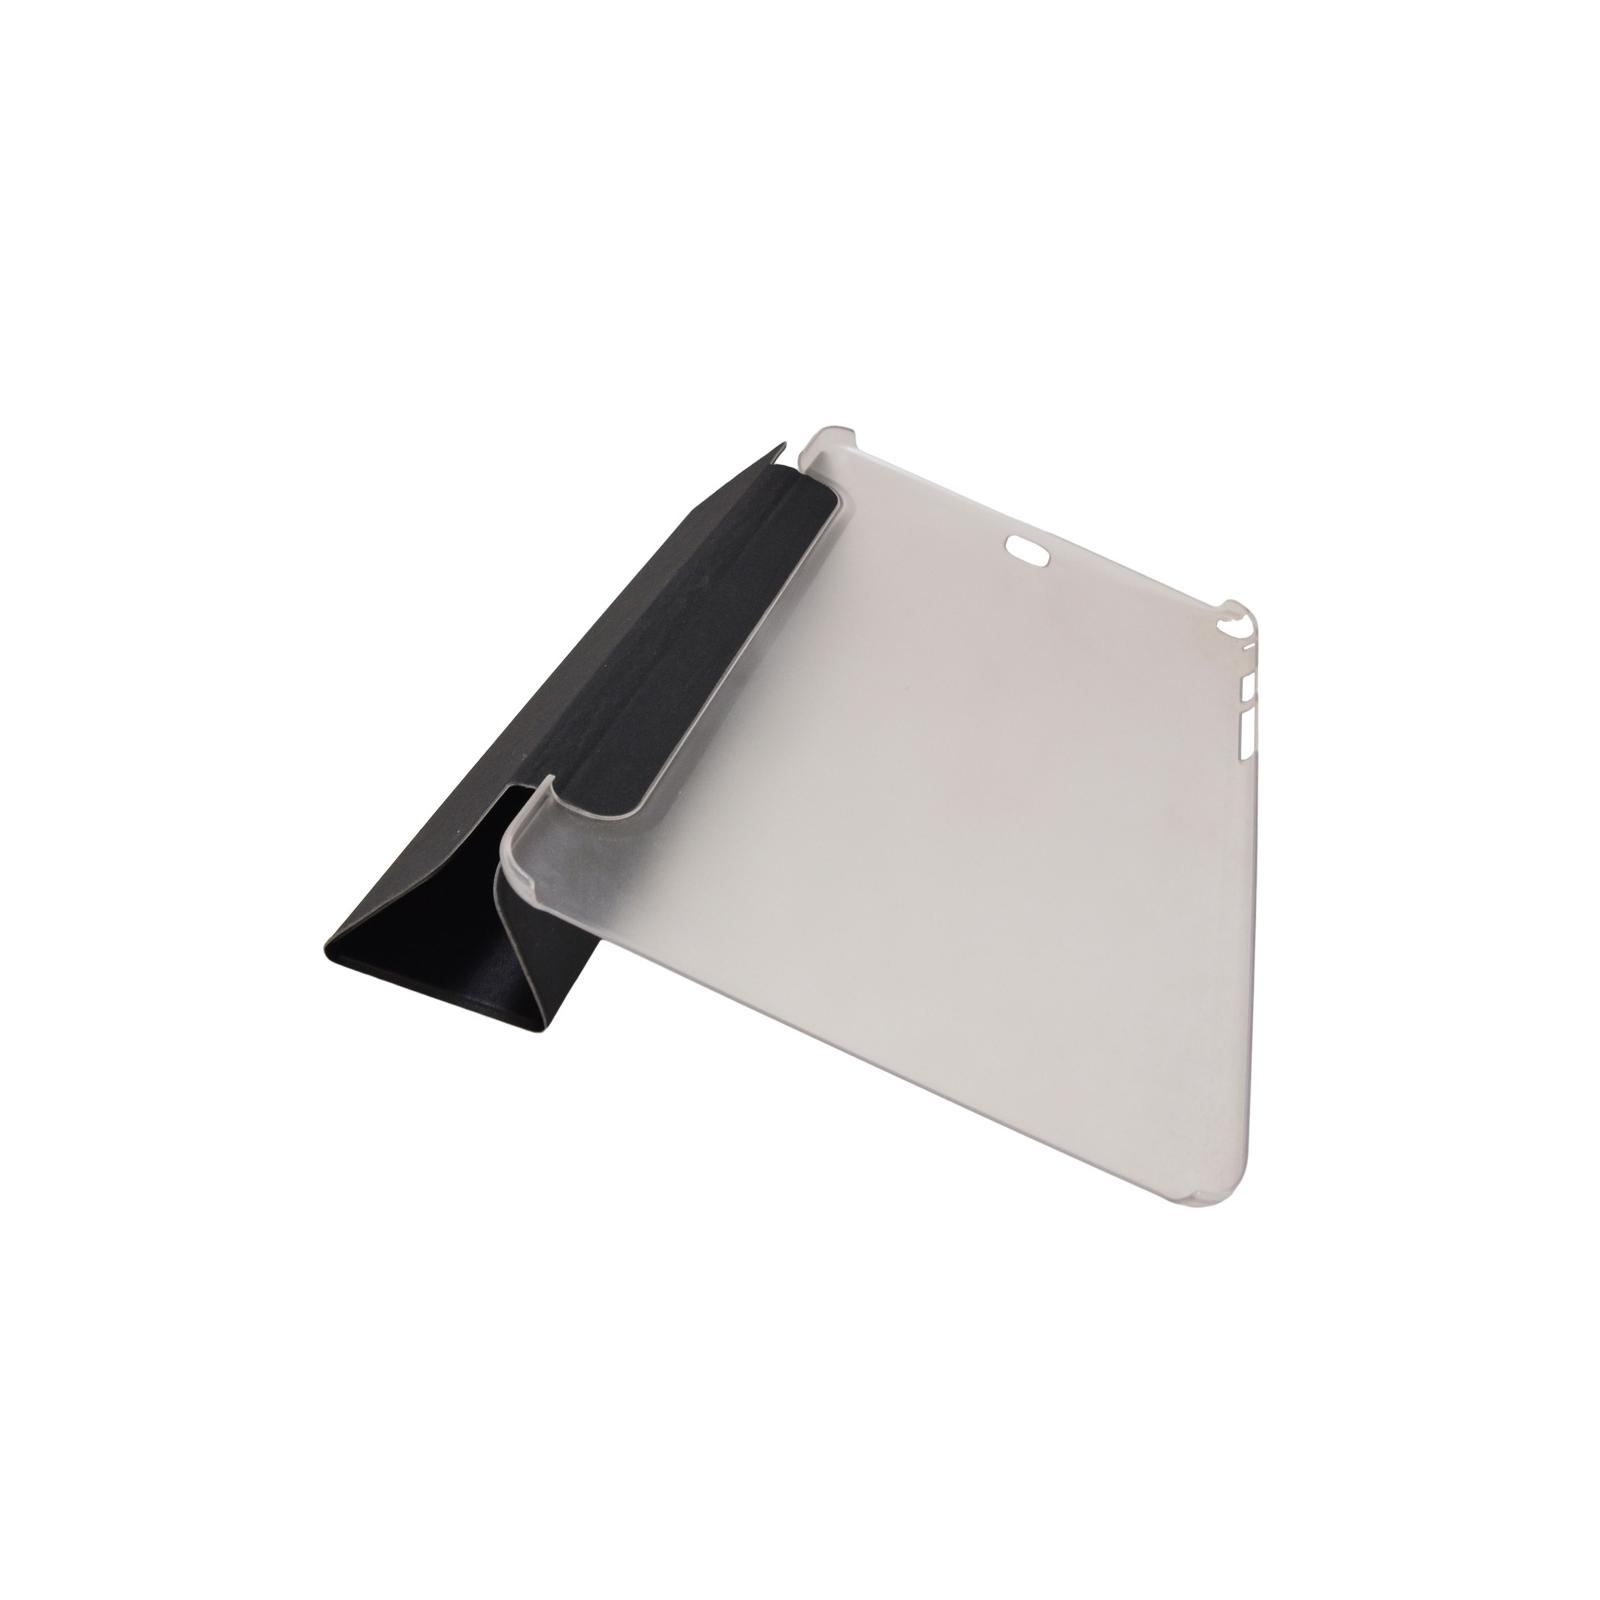 "Чехол для планшета Pro-case 9,7"" TFC Samsung T550/555(Tab A) Black (PCTFCT550Bl) изображение 3"